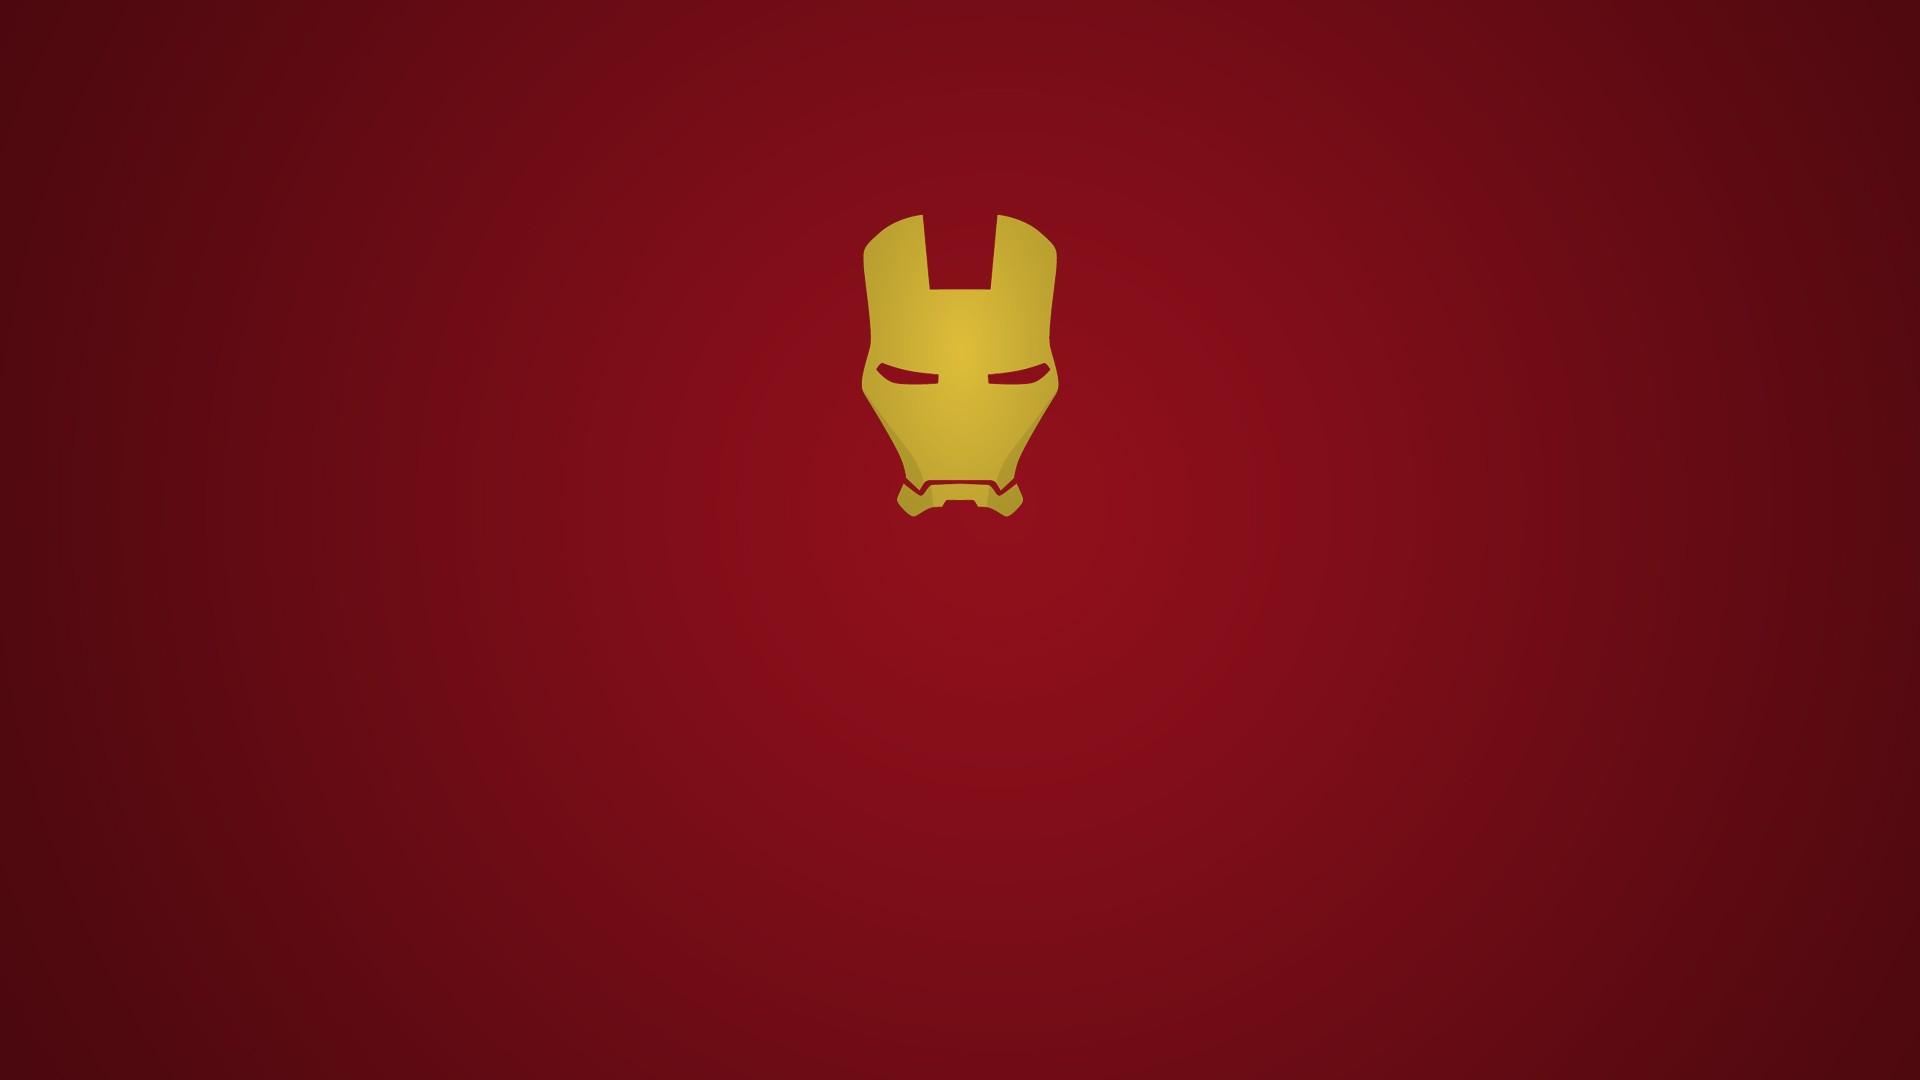 Iphone 6s Plus 4k Wallpaper: 1080x1920 Iron Man Simple 2 Iphone 7,6s,6 Plus, Pixel Xl